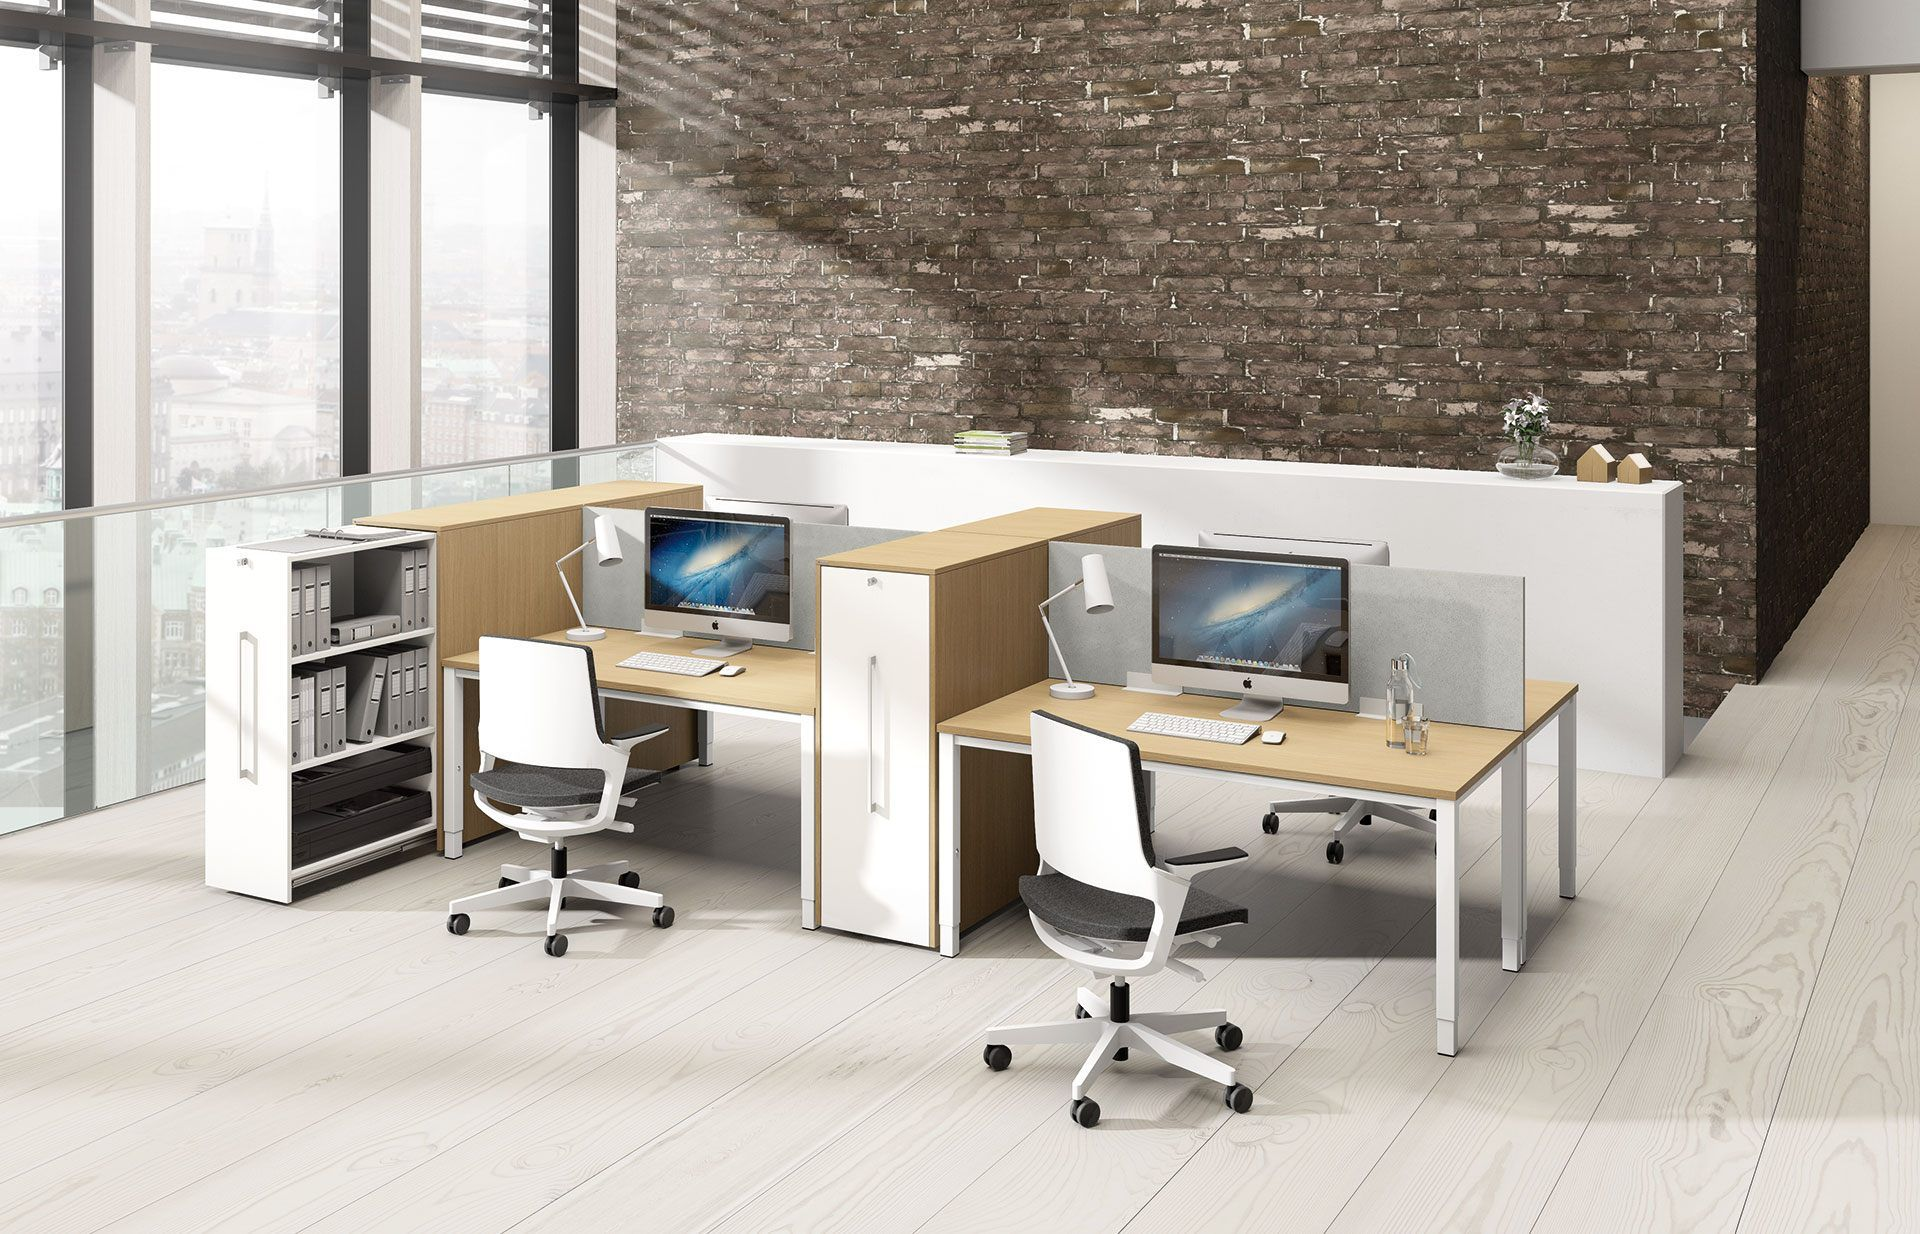 Abgeteilte Arbeitsplätze, Büromöbel Augsburg | Arbeitsplatz | Pinterest